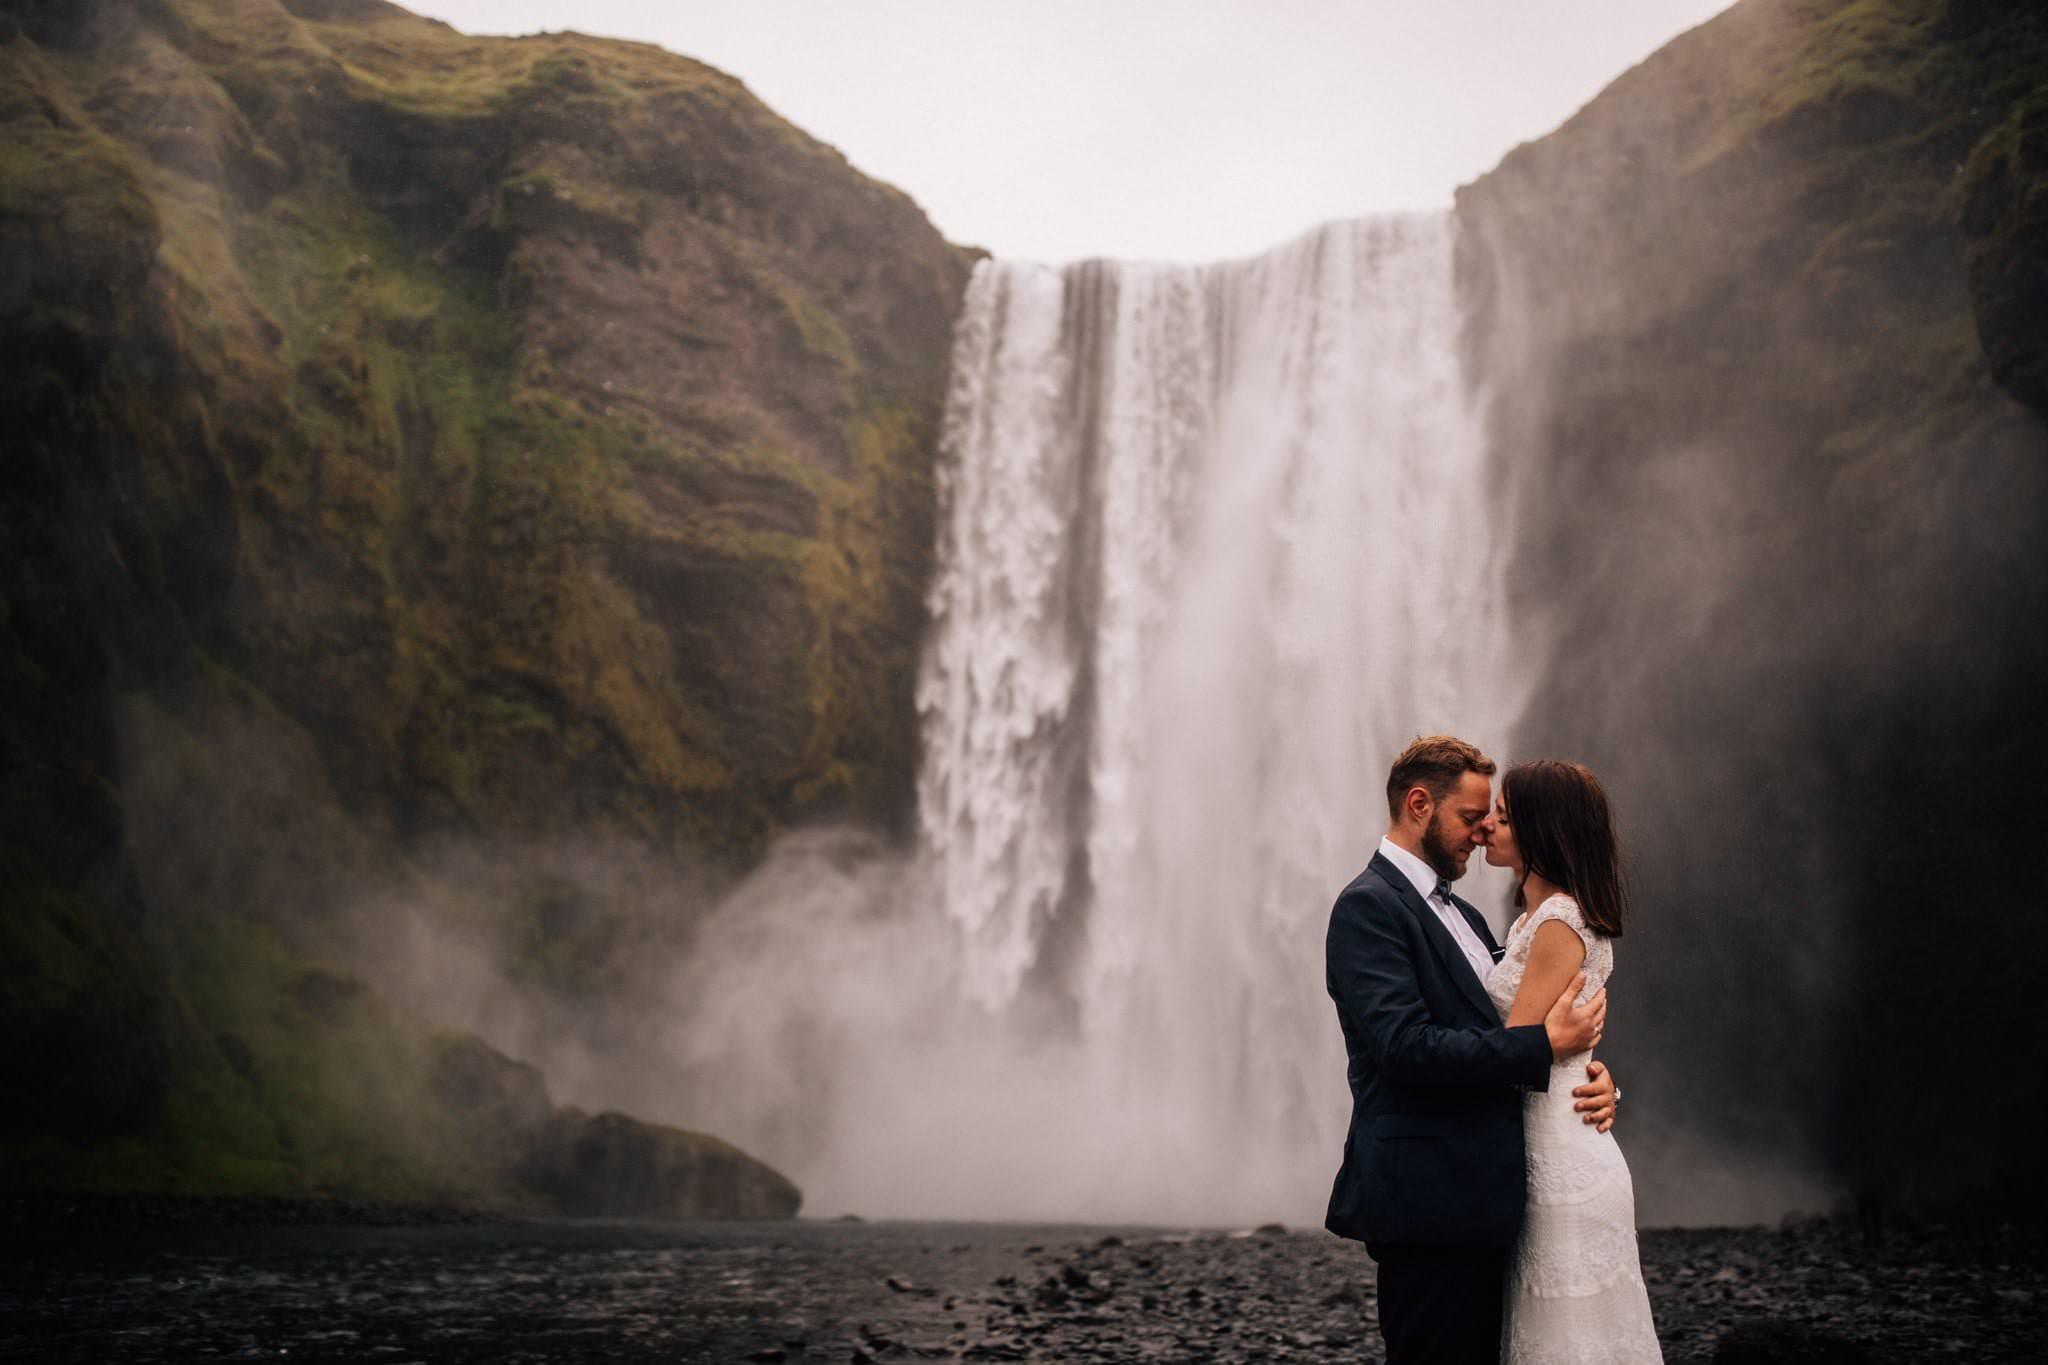 Sesja pary młodej Sesja ślubna Islandia wodospad Skógafoss